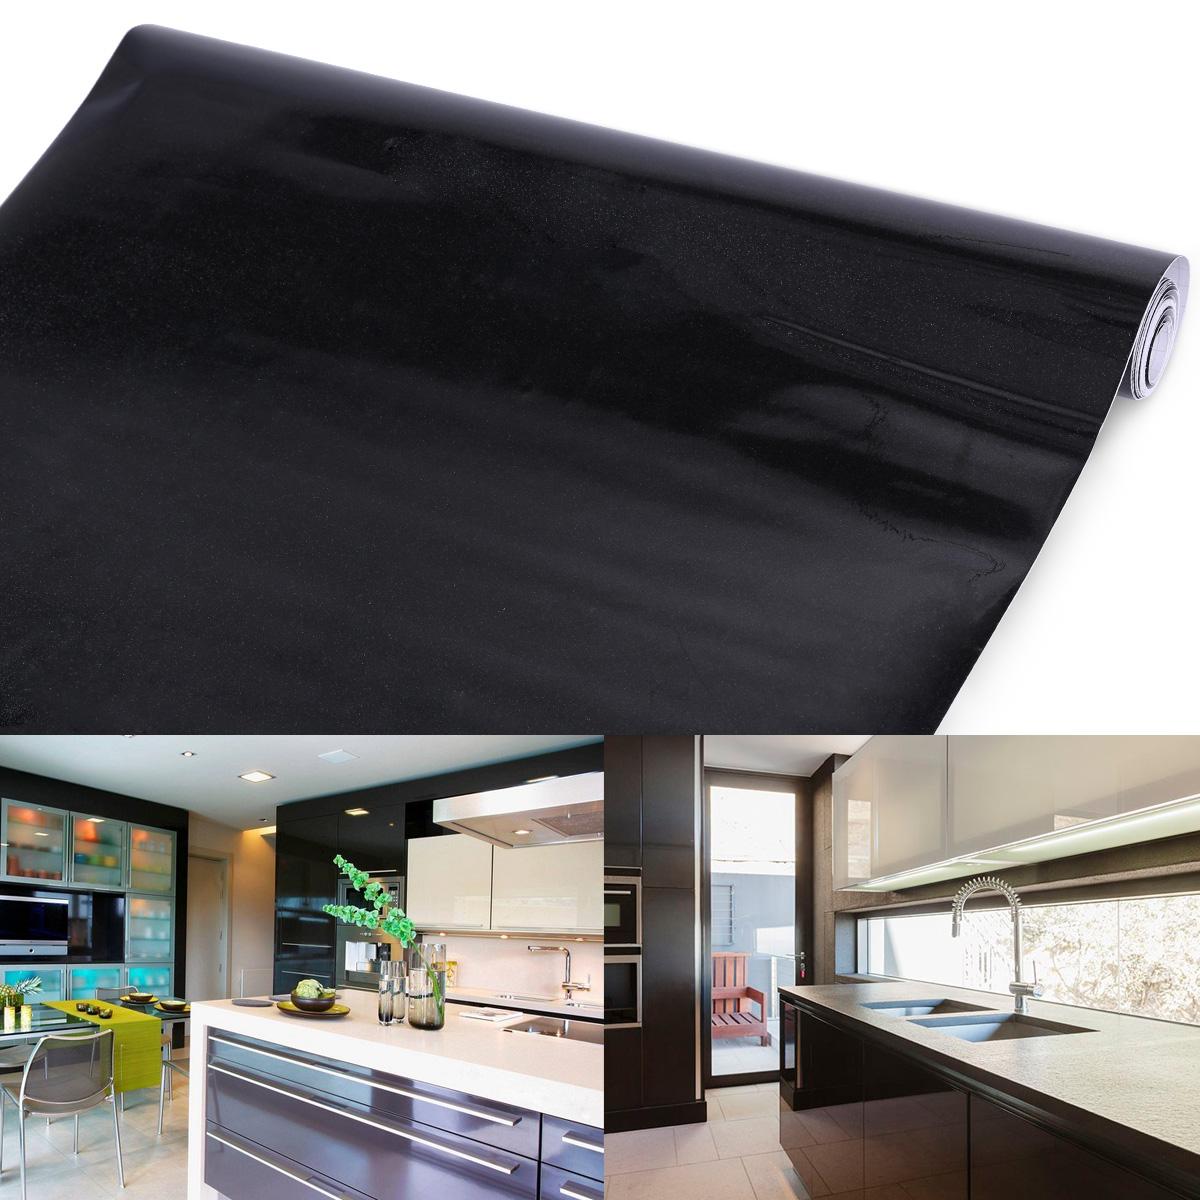 k chenfolie selbstklebefolie klebefolien f r fliesen k che m bel plotterfolie ebay. Black Bedroom Furniture Sets. Home Design Ideas